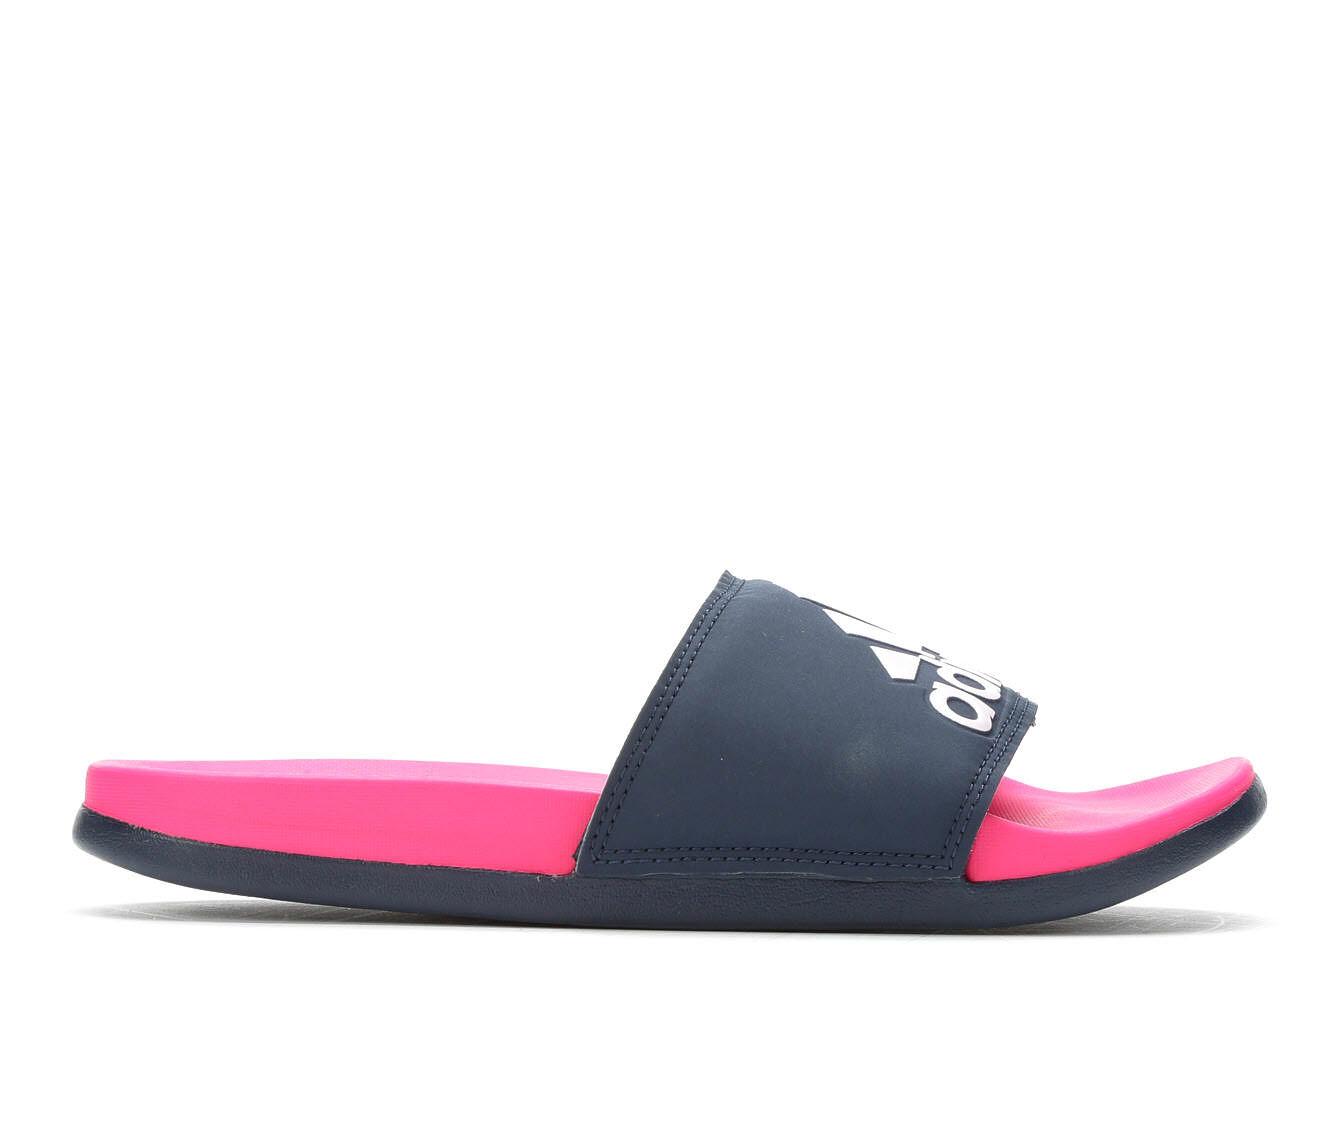 uk shoes_kd7120